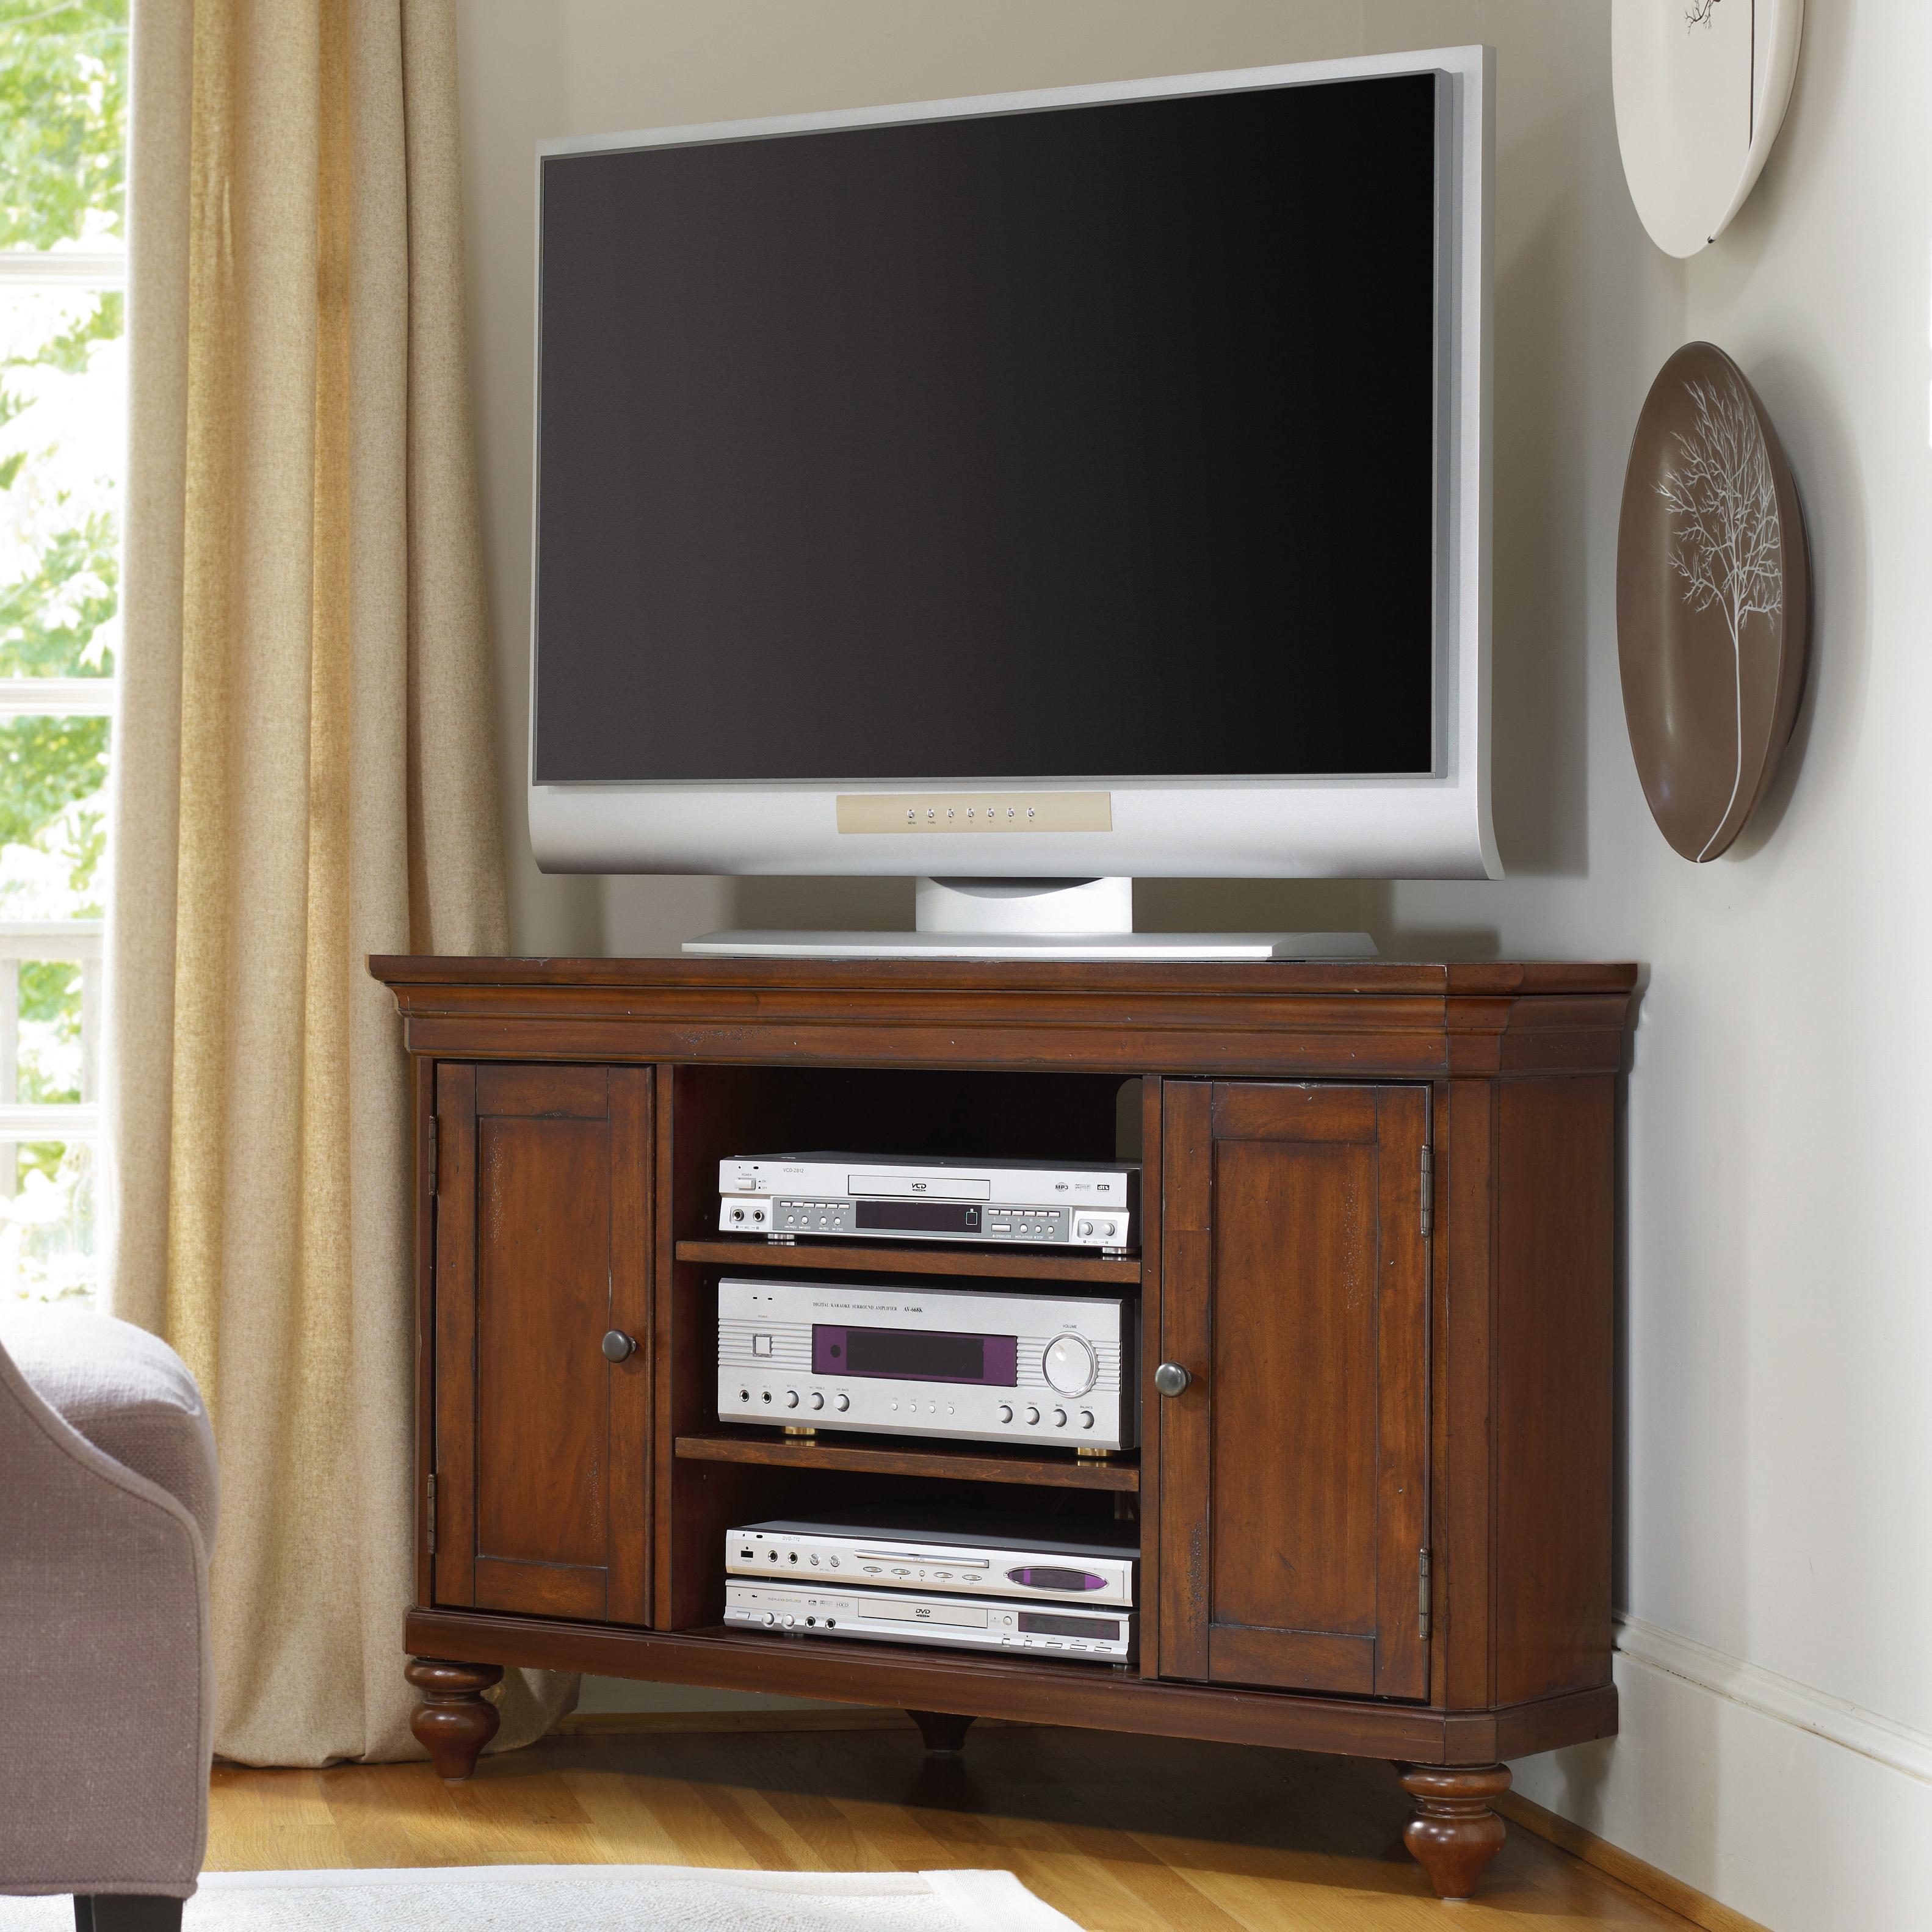 Hooker Furniture Wendover Corner Entertainment Console - Item Number: 1037-56488